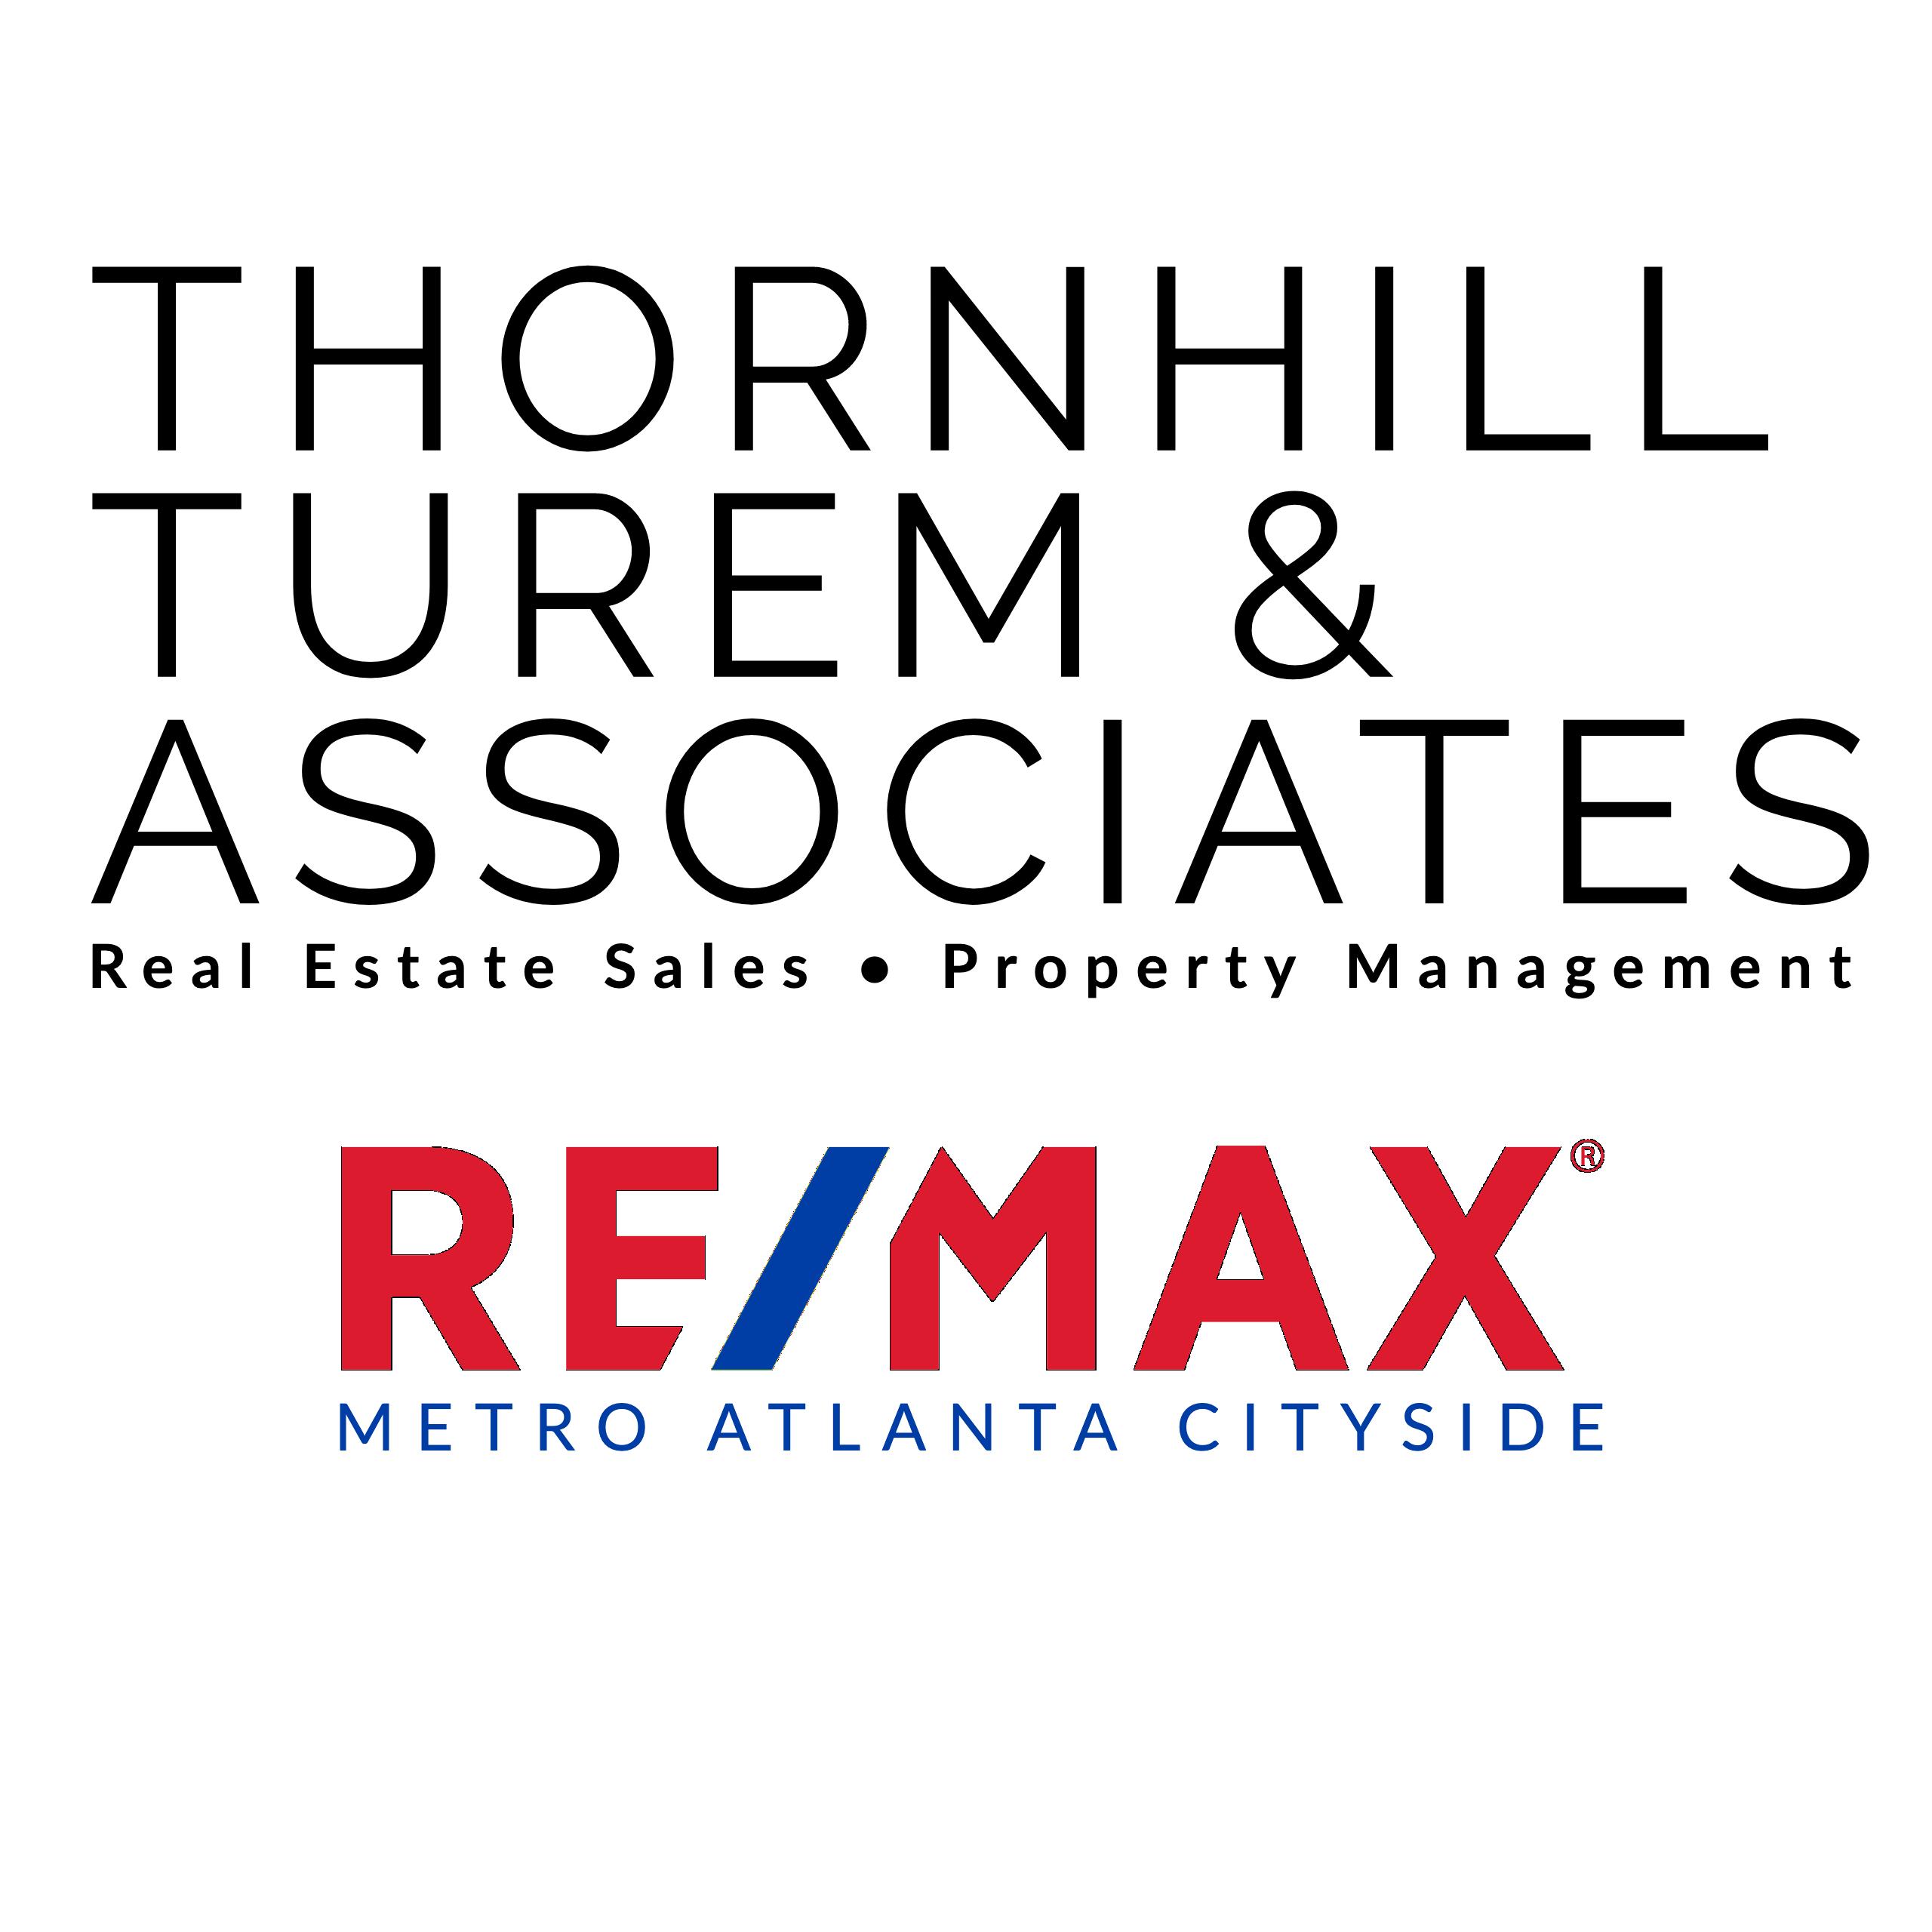 Thornhill Turem & Associates - RE/MAX Metro Atlanta Cityside logo